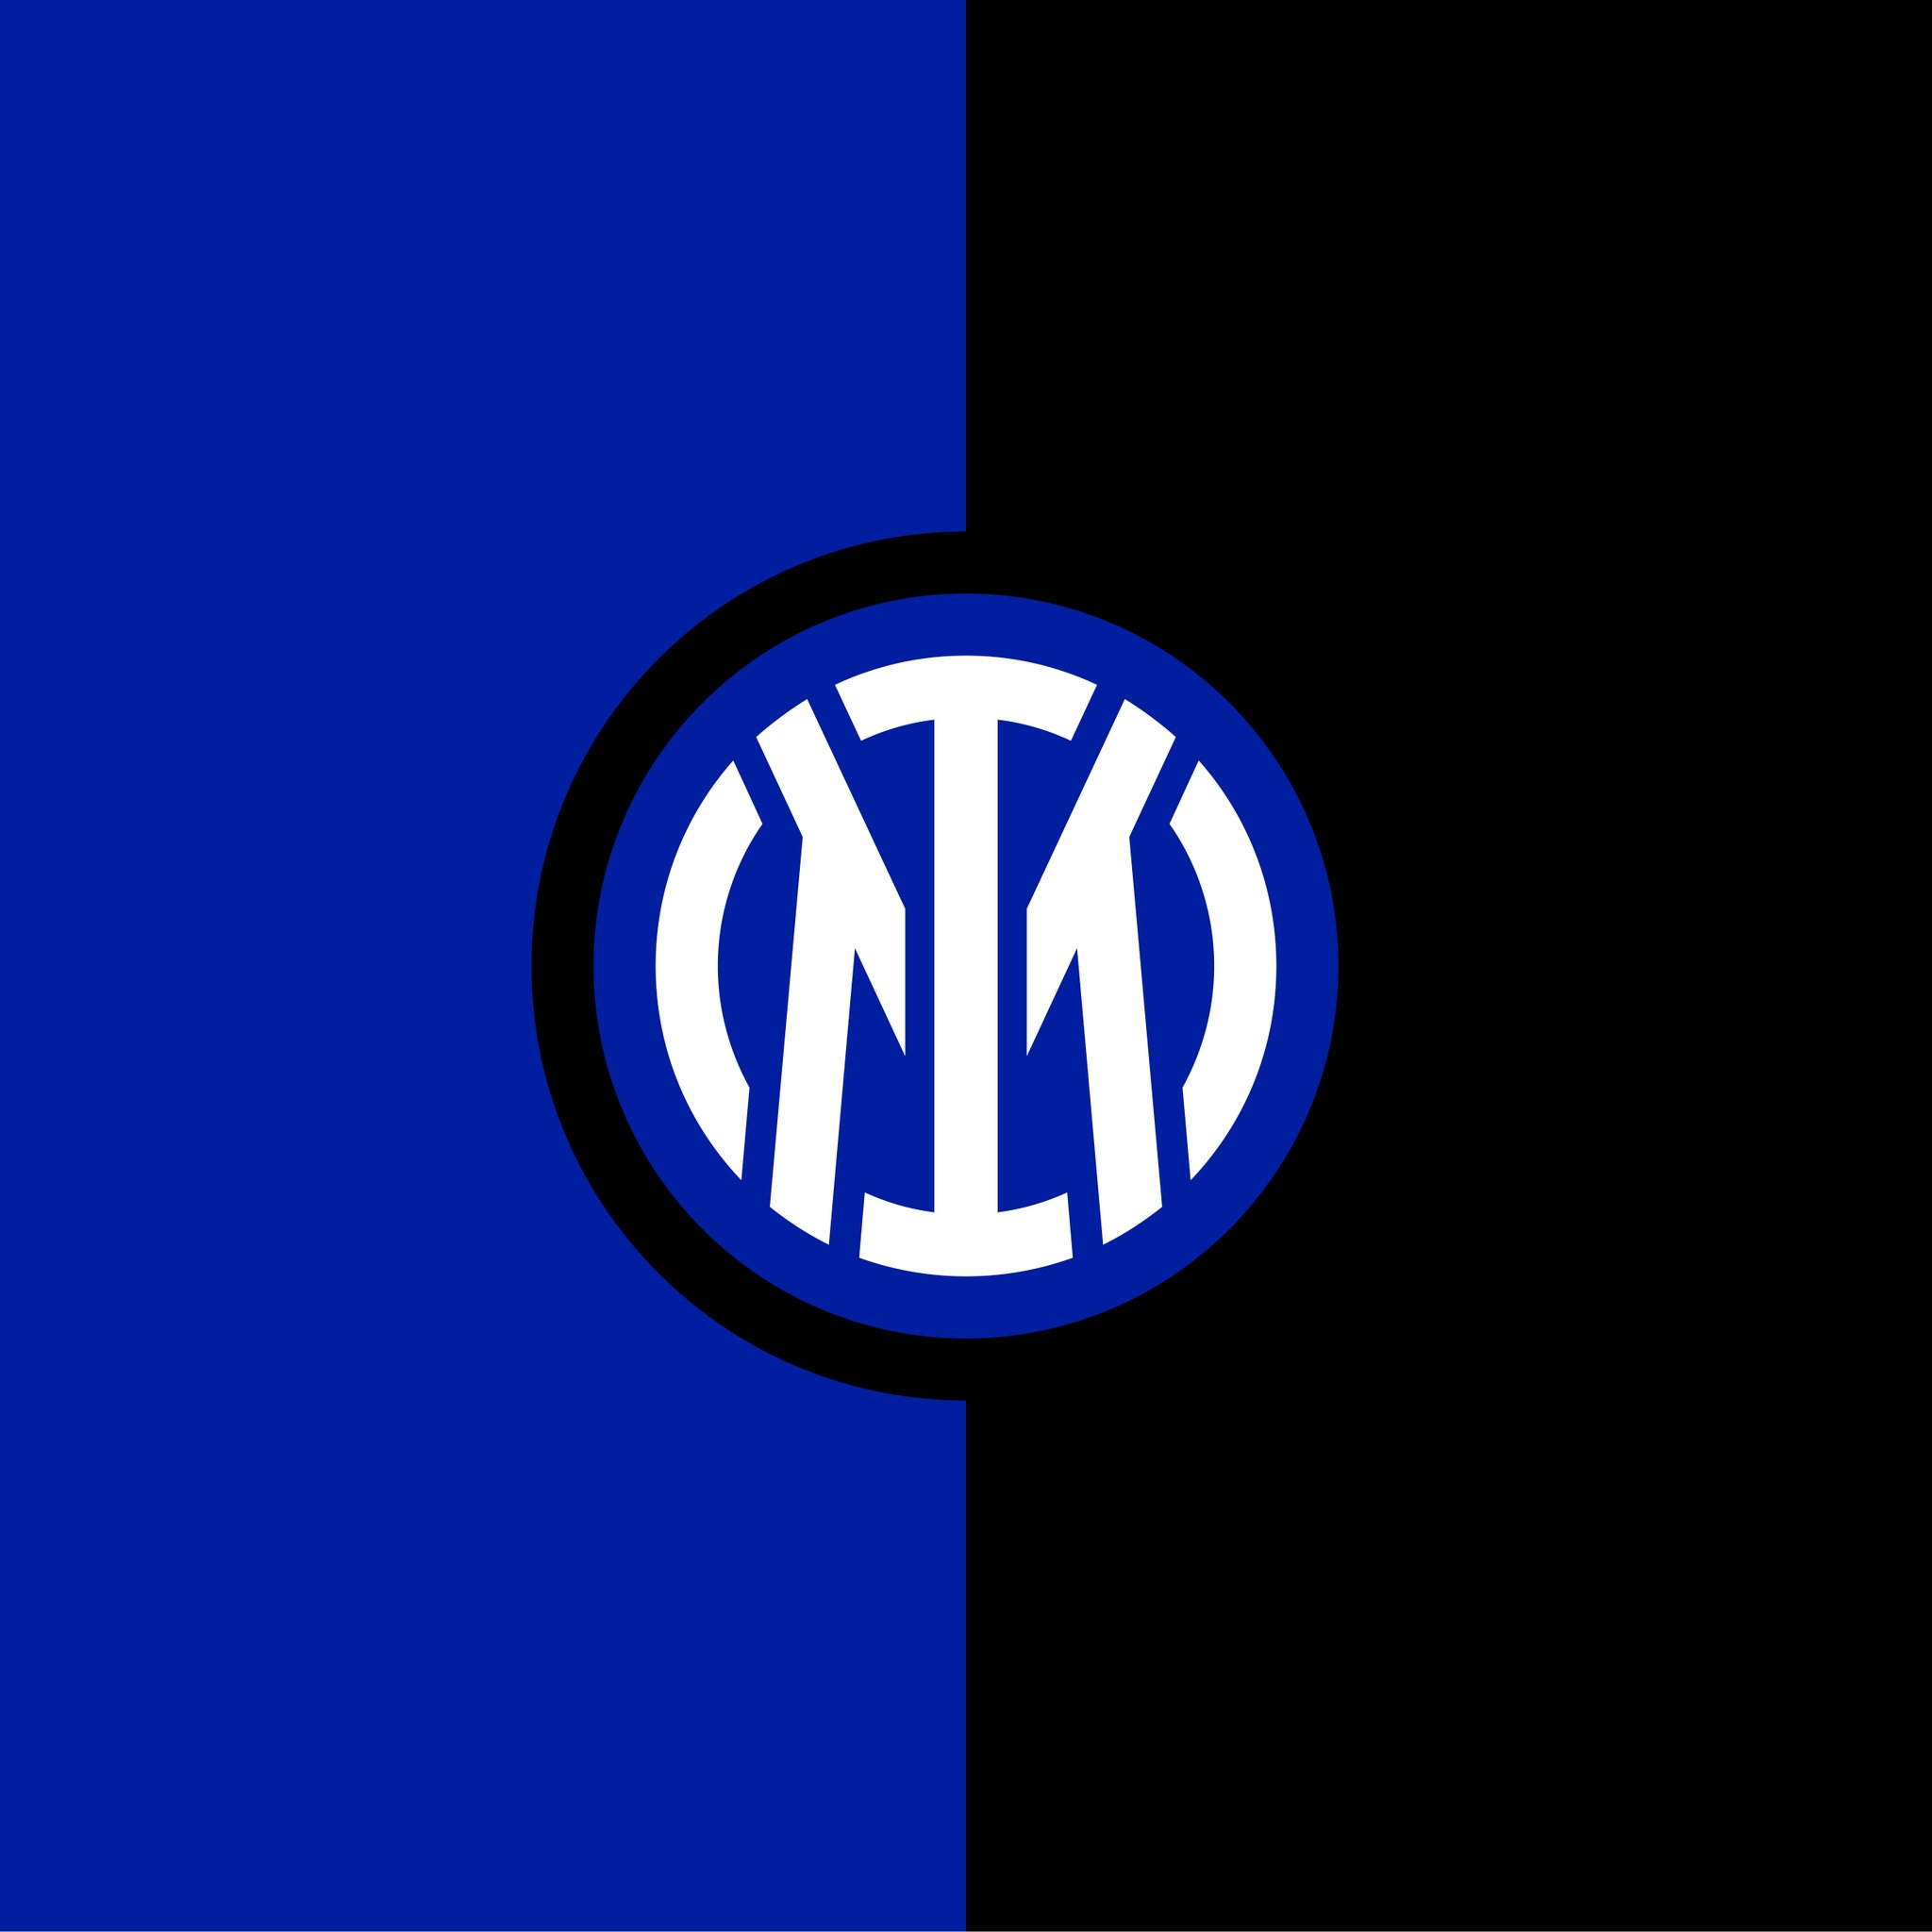 «Интер» представил новую эмблему